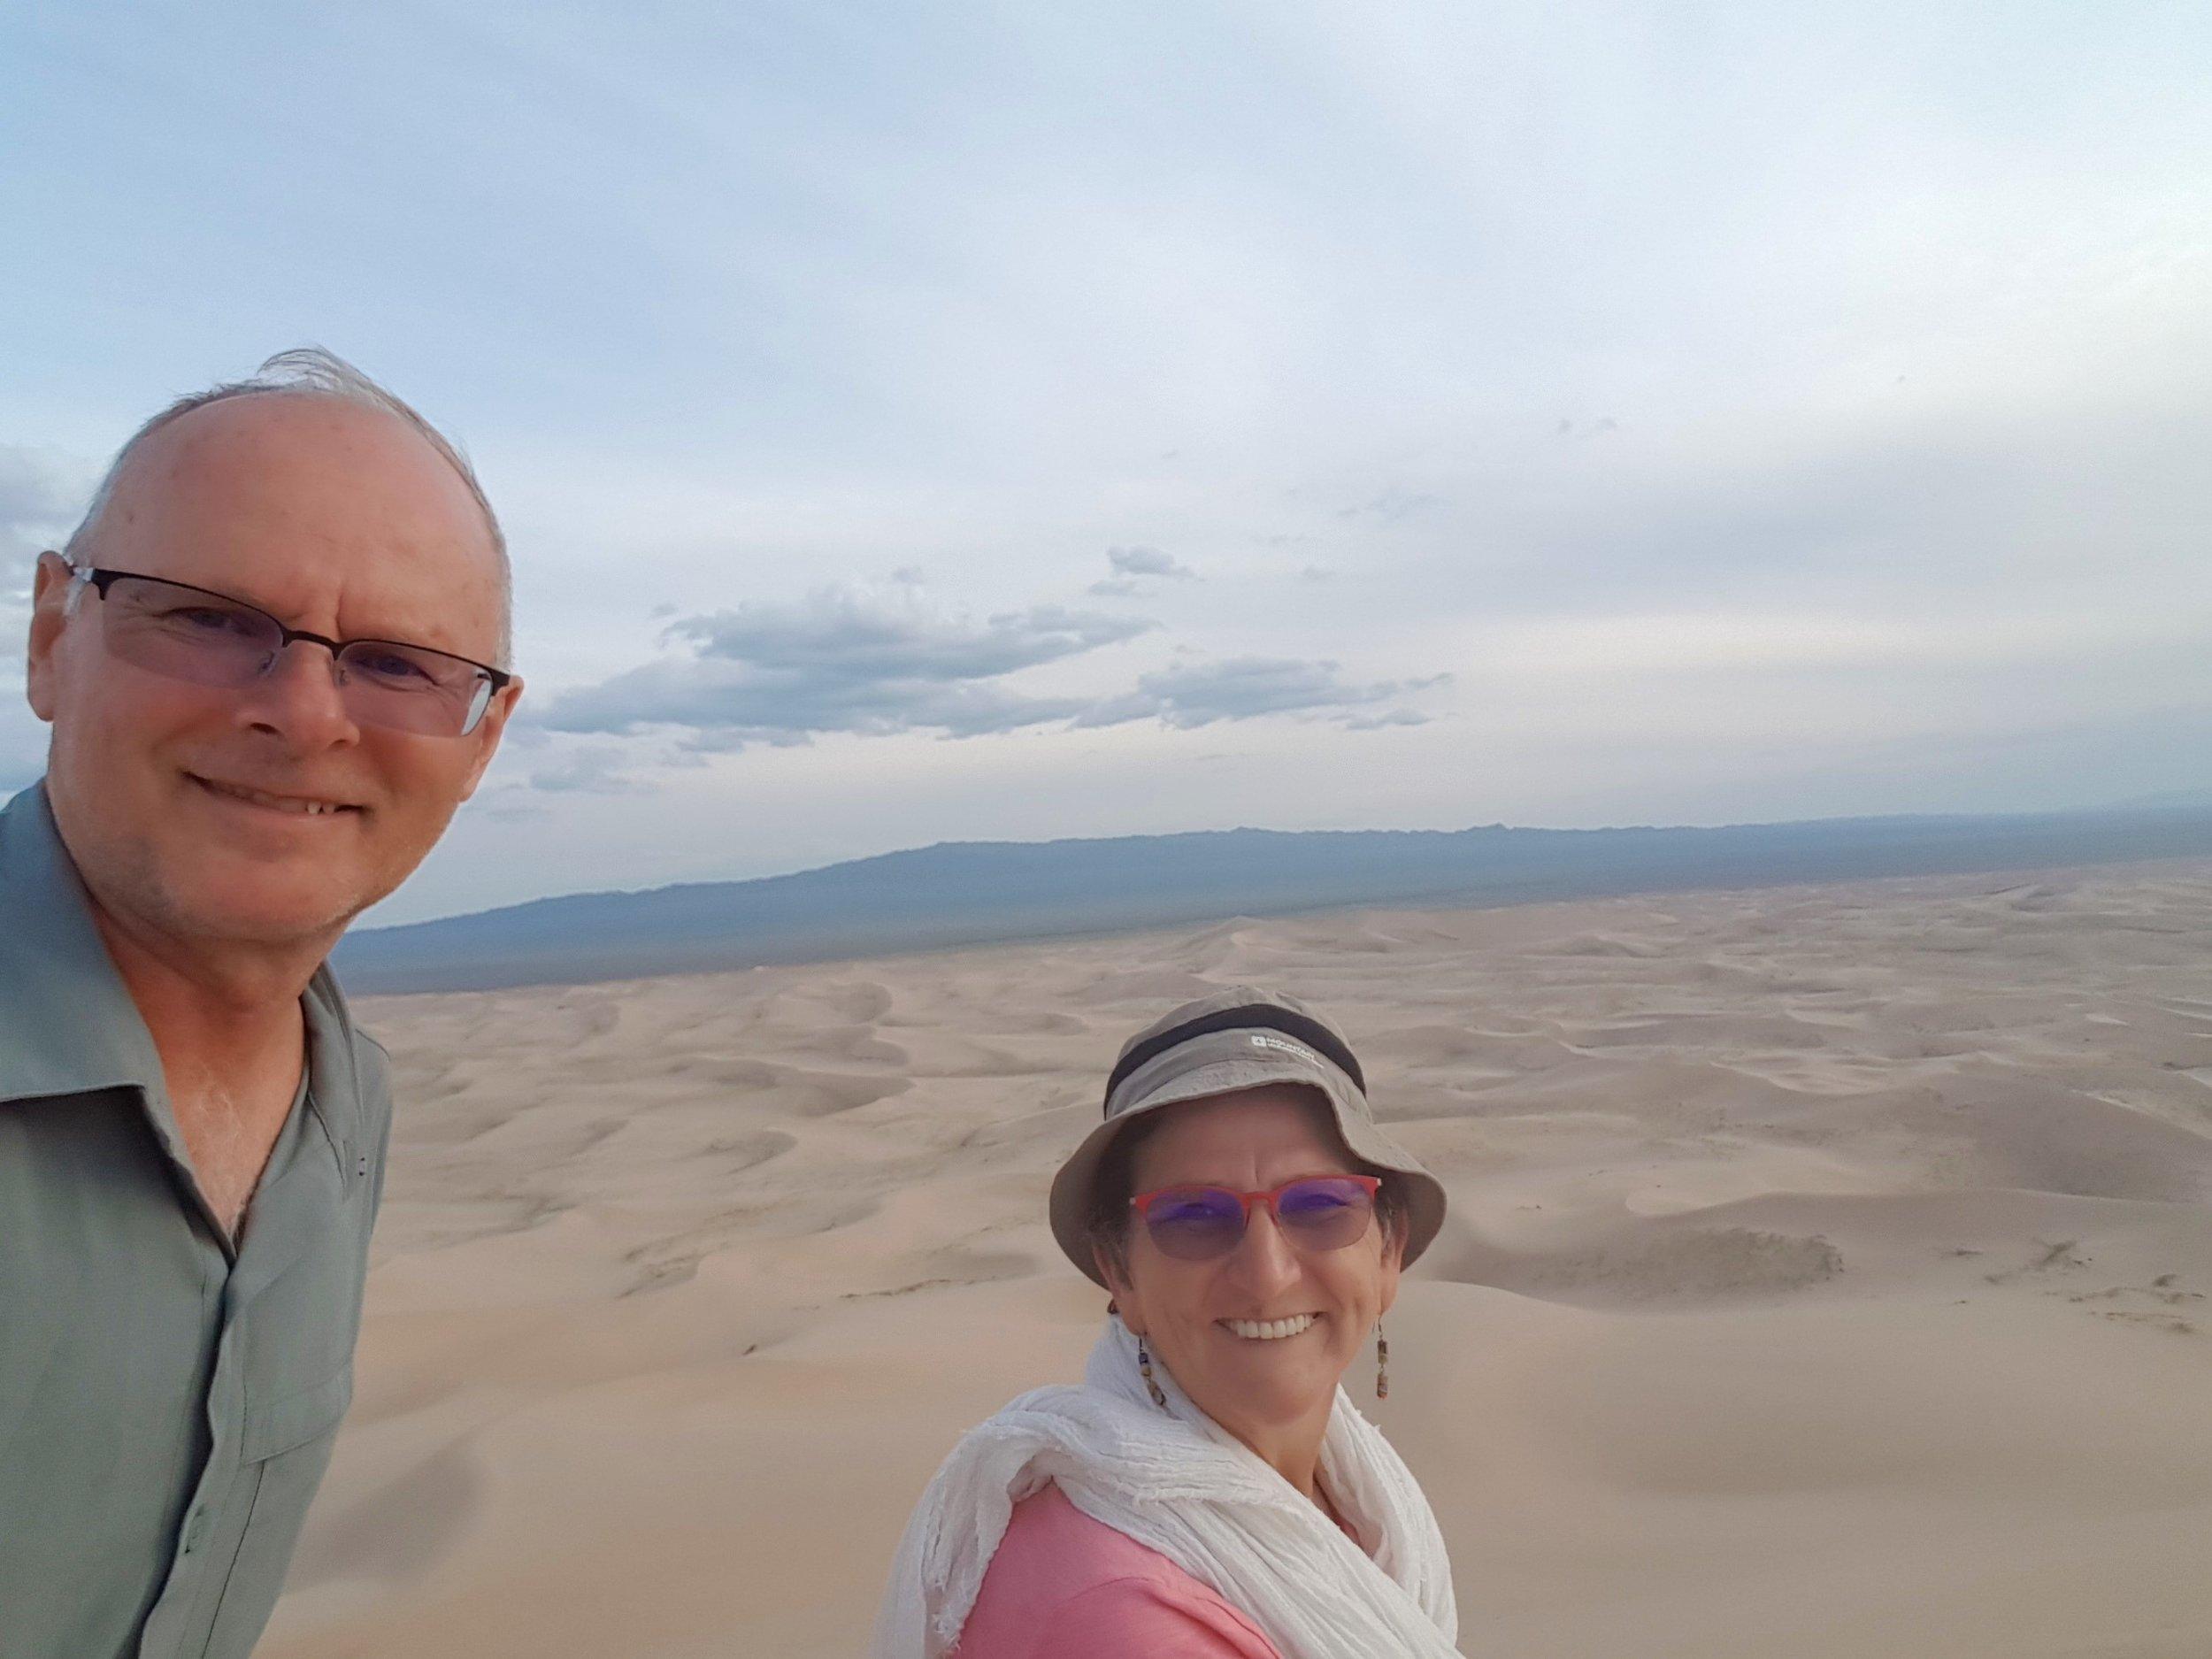 On top of the Khongoryn Els sand dunes